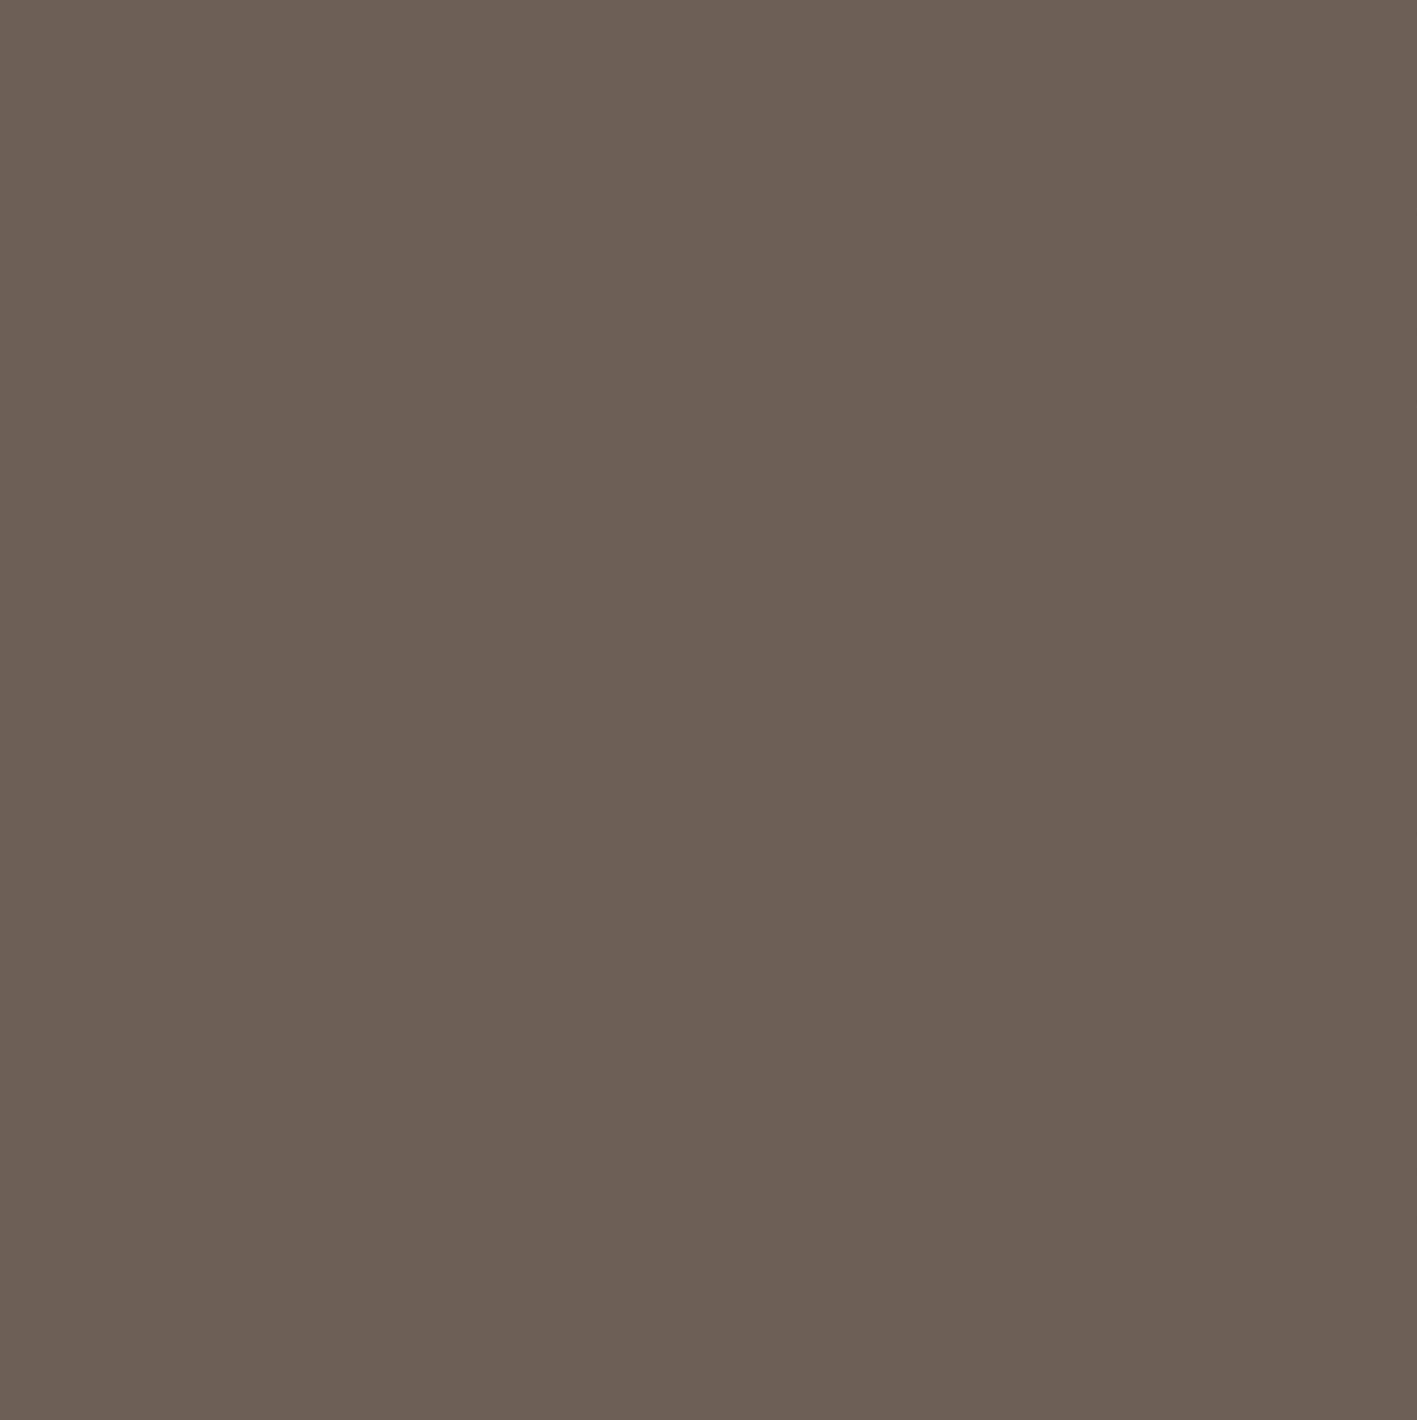 Crayons of Cerim Hazelnut Matte 6mm 120 x 120